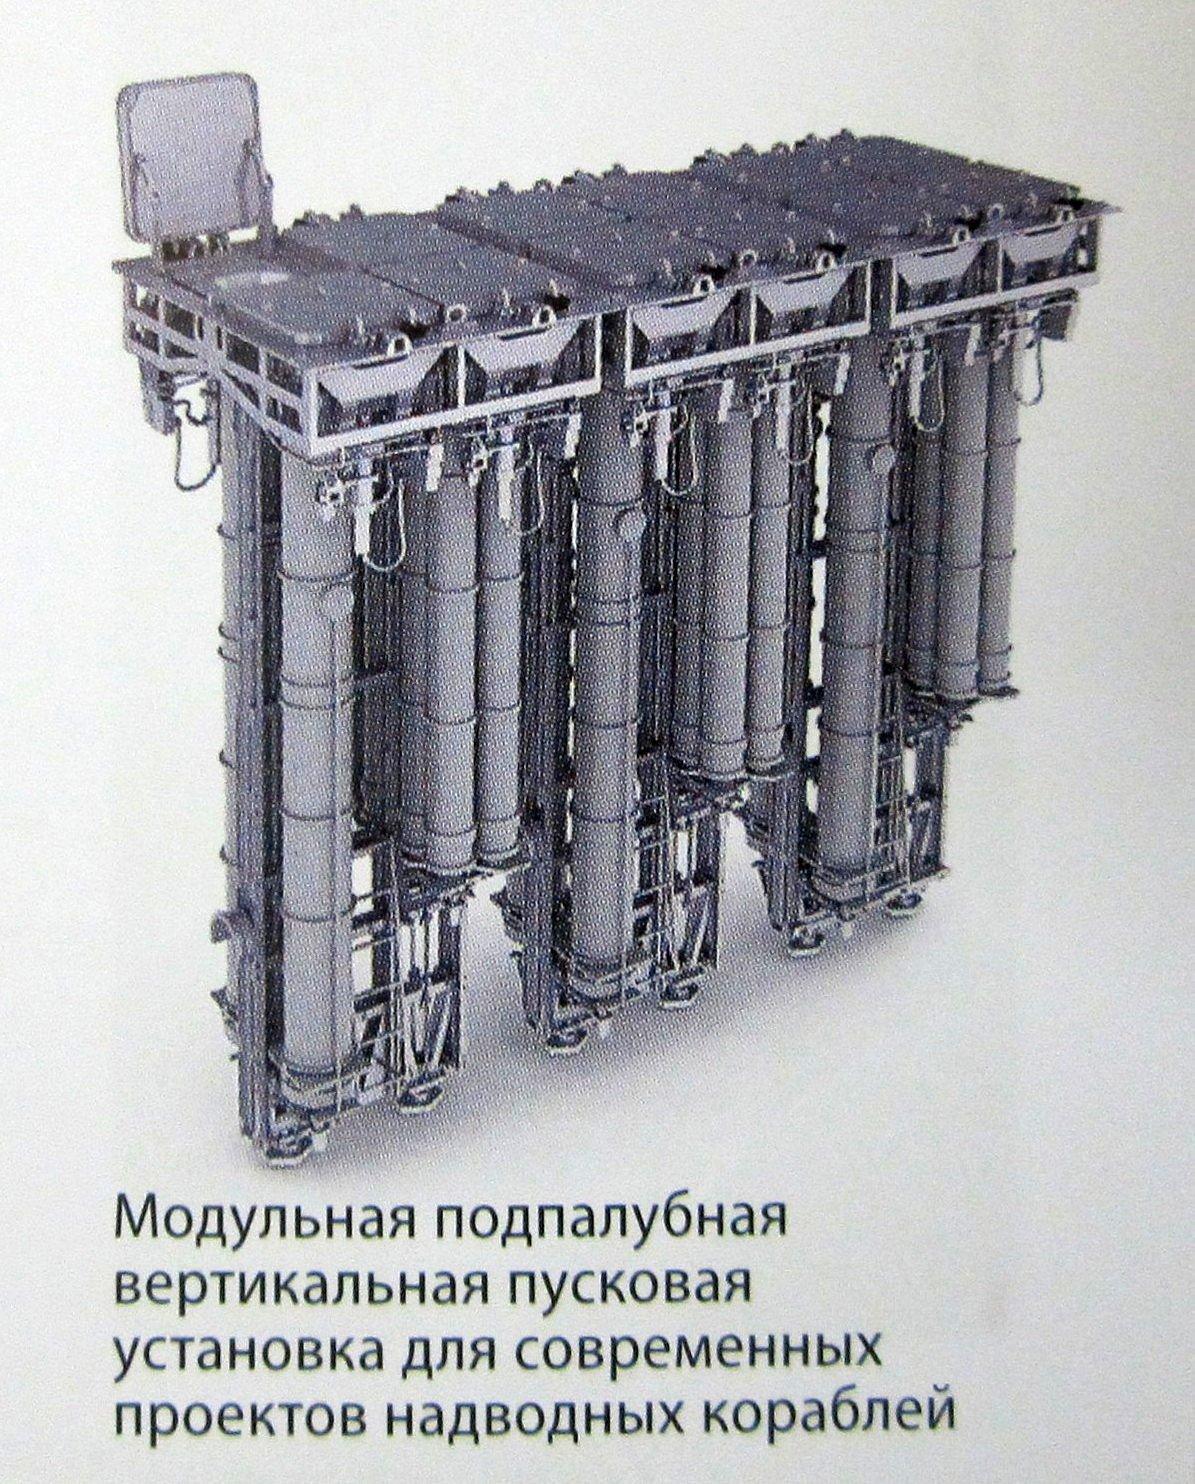 Poliment-Redut Naval Air Defense System - Page 6 DFgHu36UIAAsdnJ?format=jpg&name=large